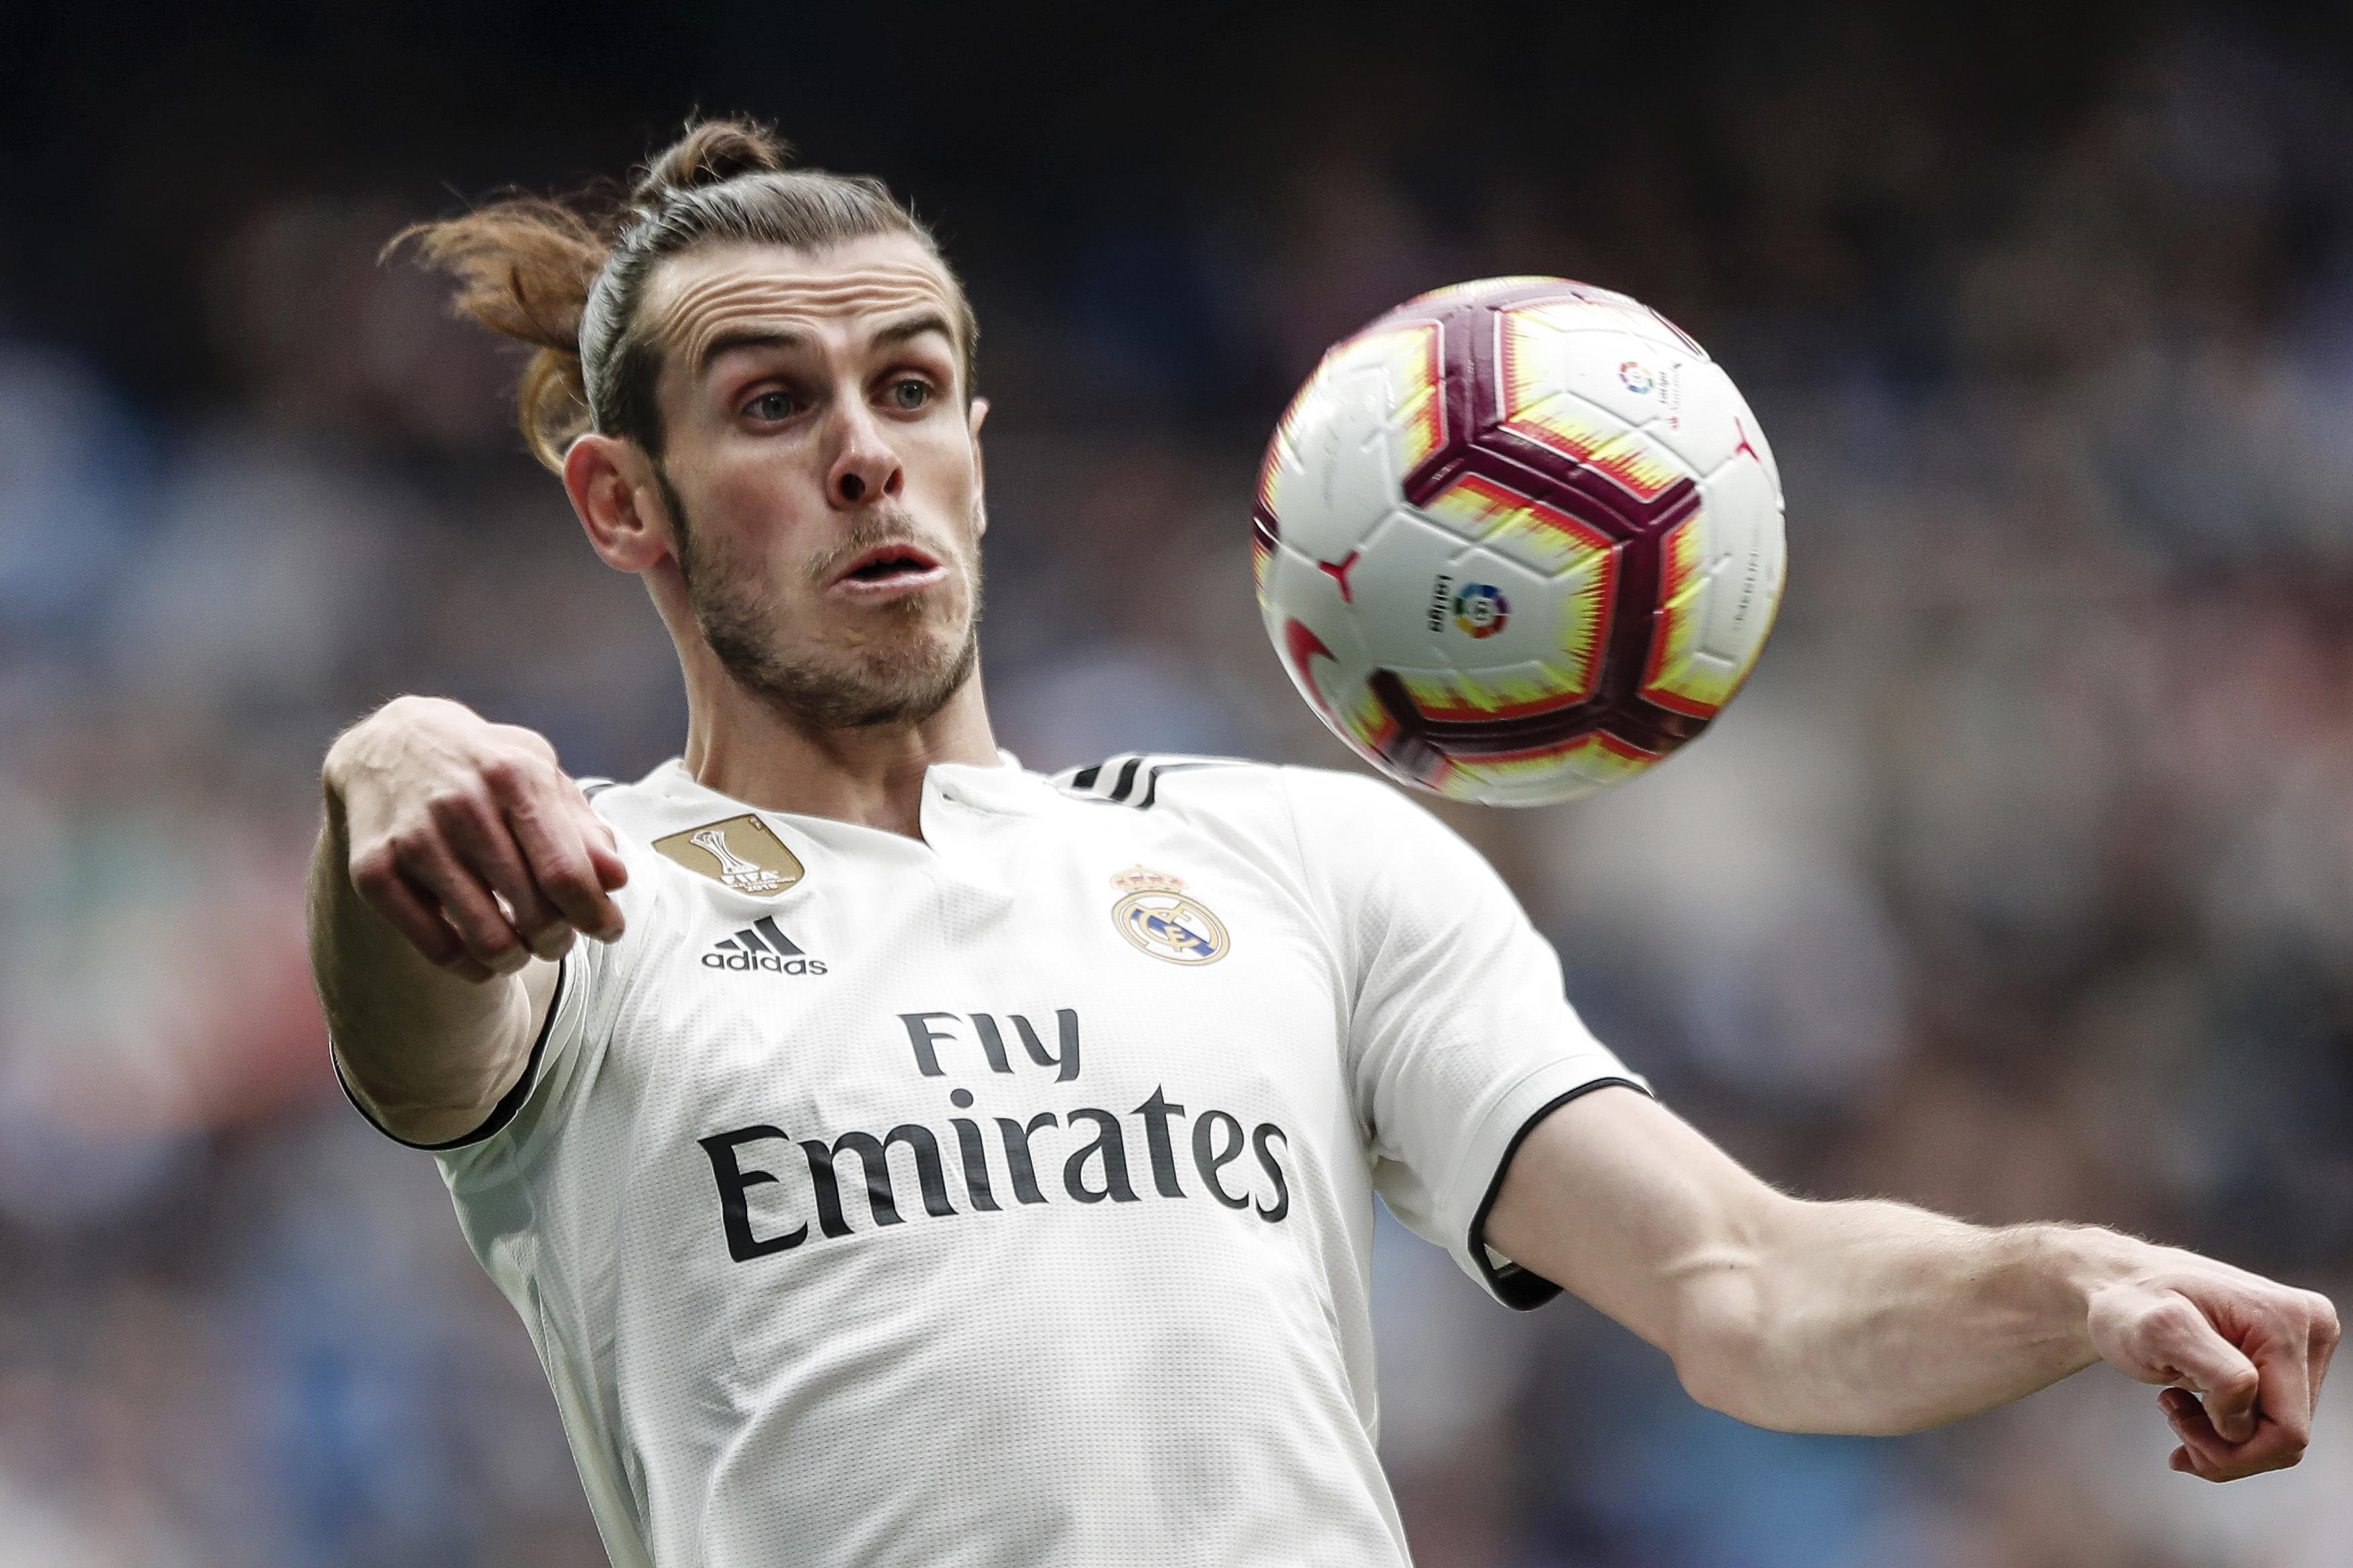 Football's top brand – Real Madrid